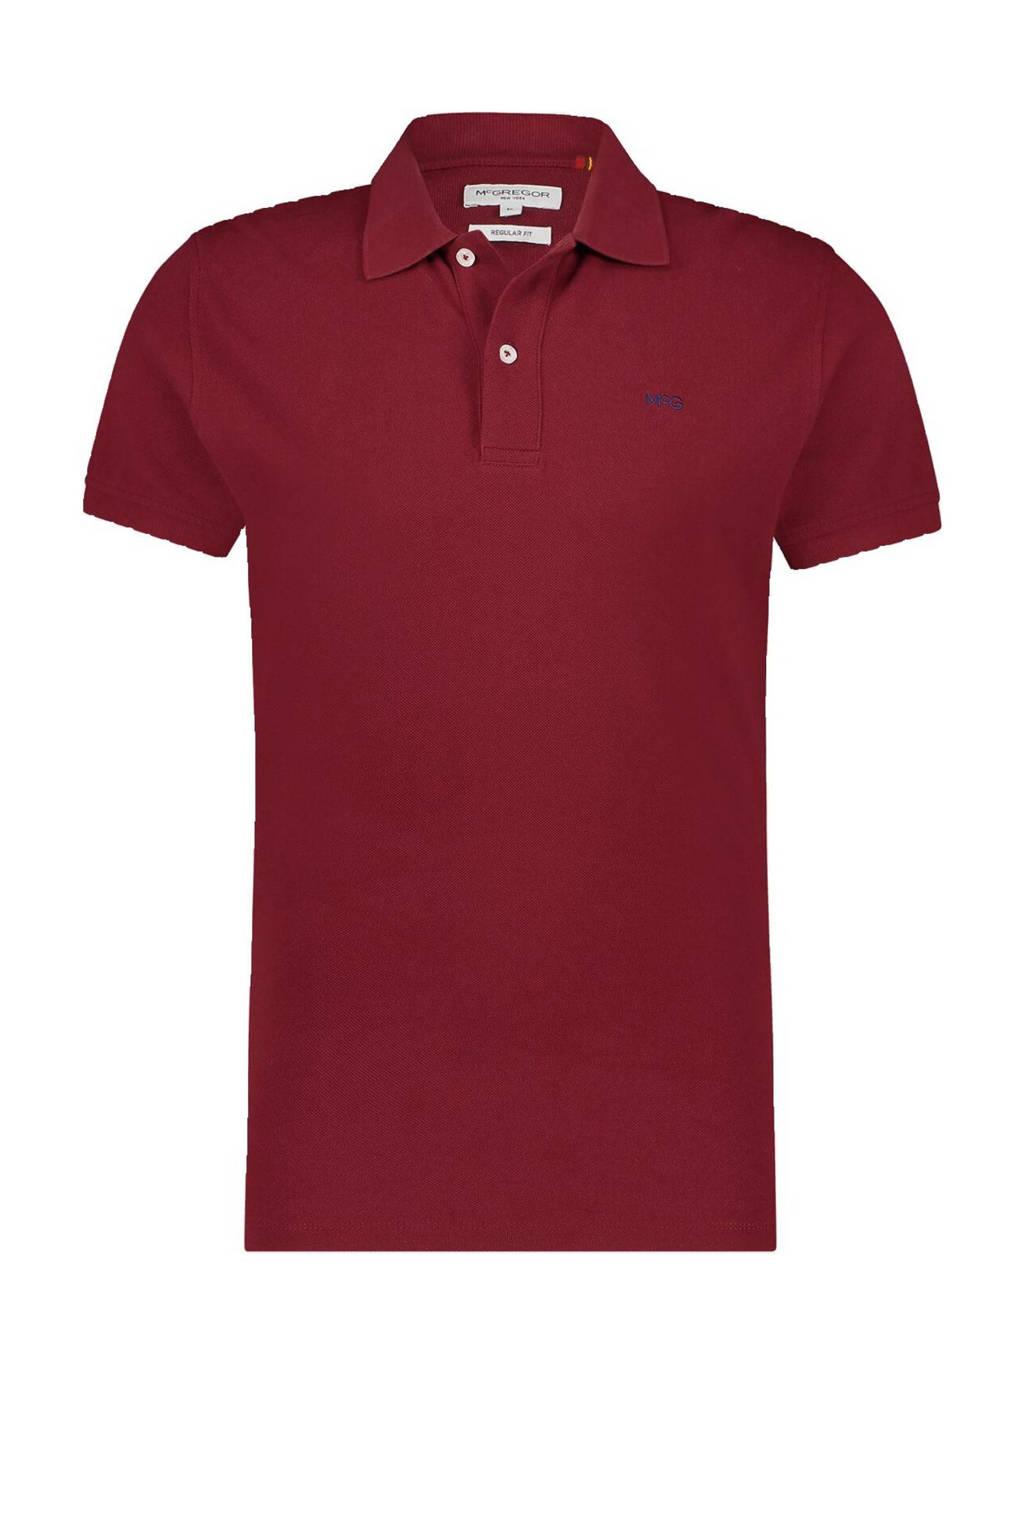 McGregor regular fit polo met logo donkerrood, Donkerrood